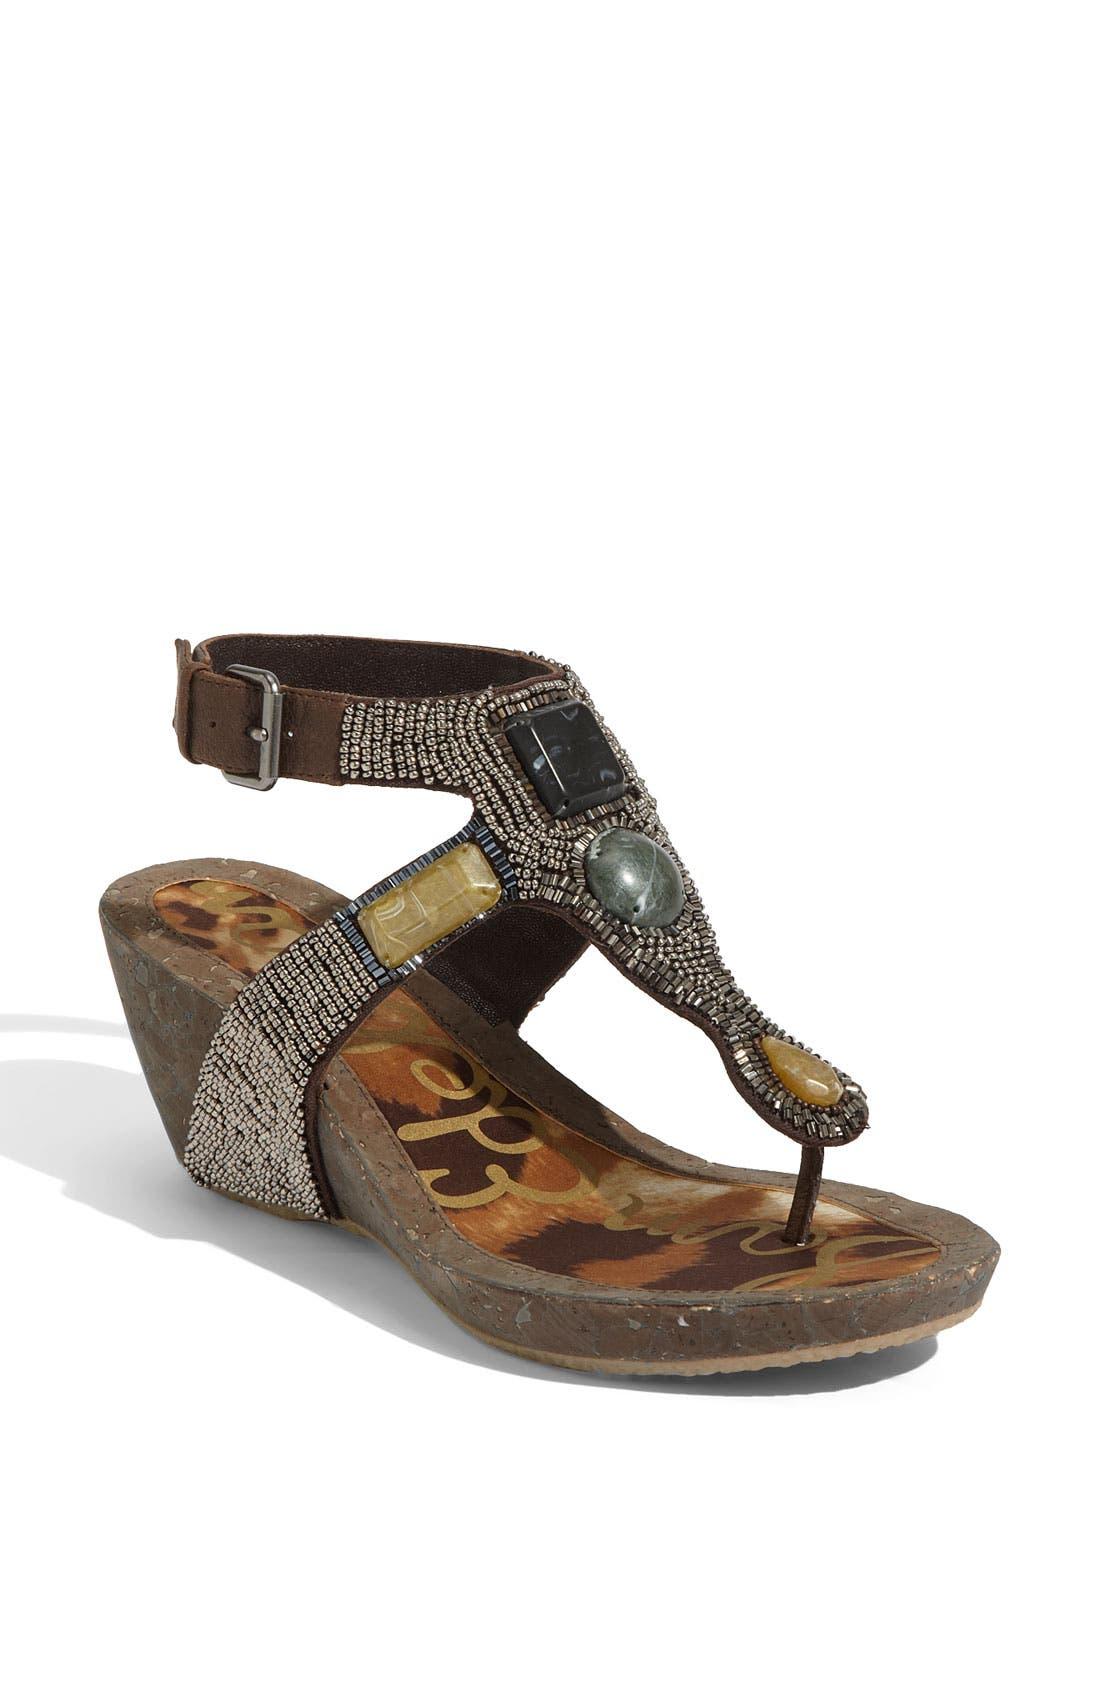 Alternate Image 1 Selected - Sam Edelman 'Nalo' Sandal